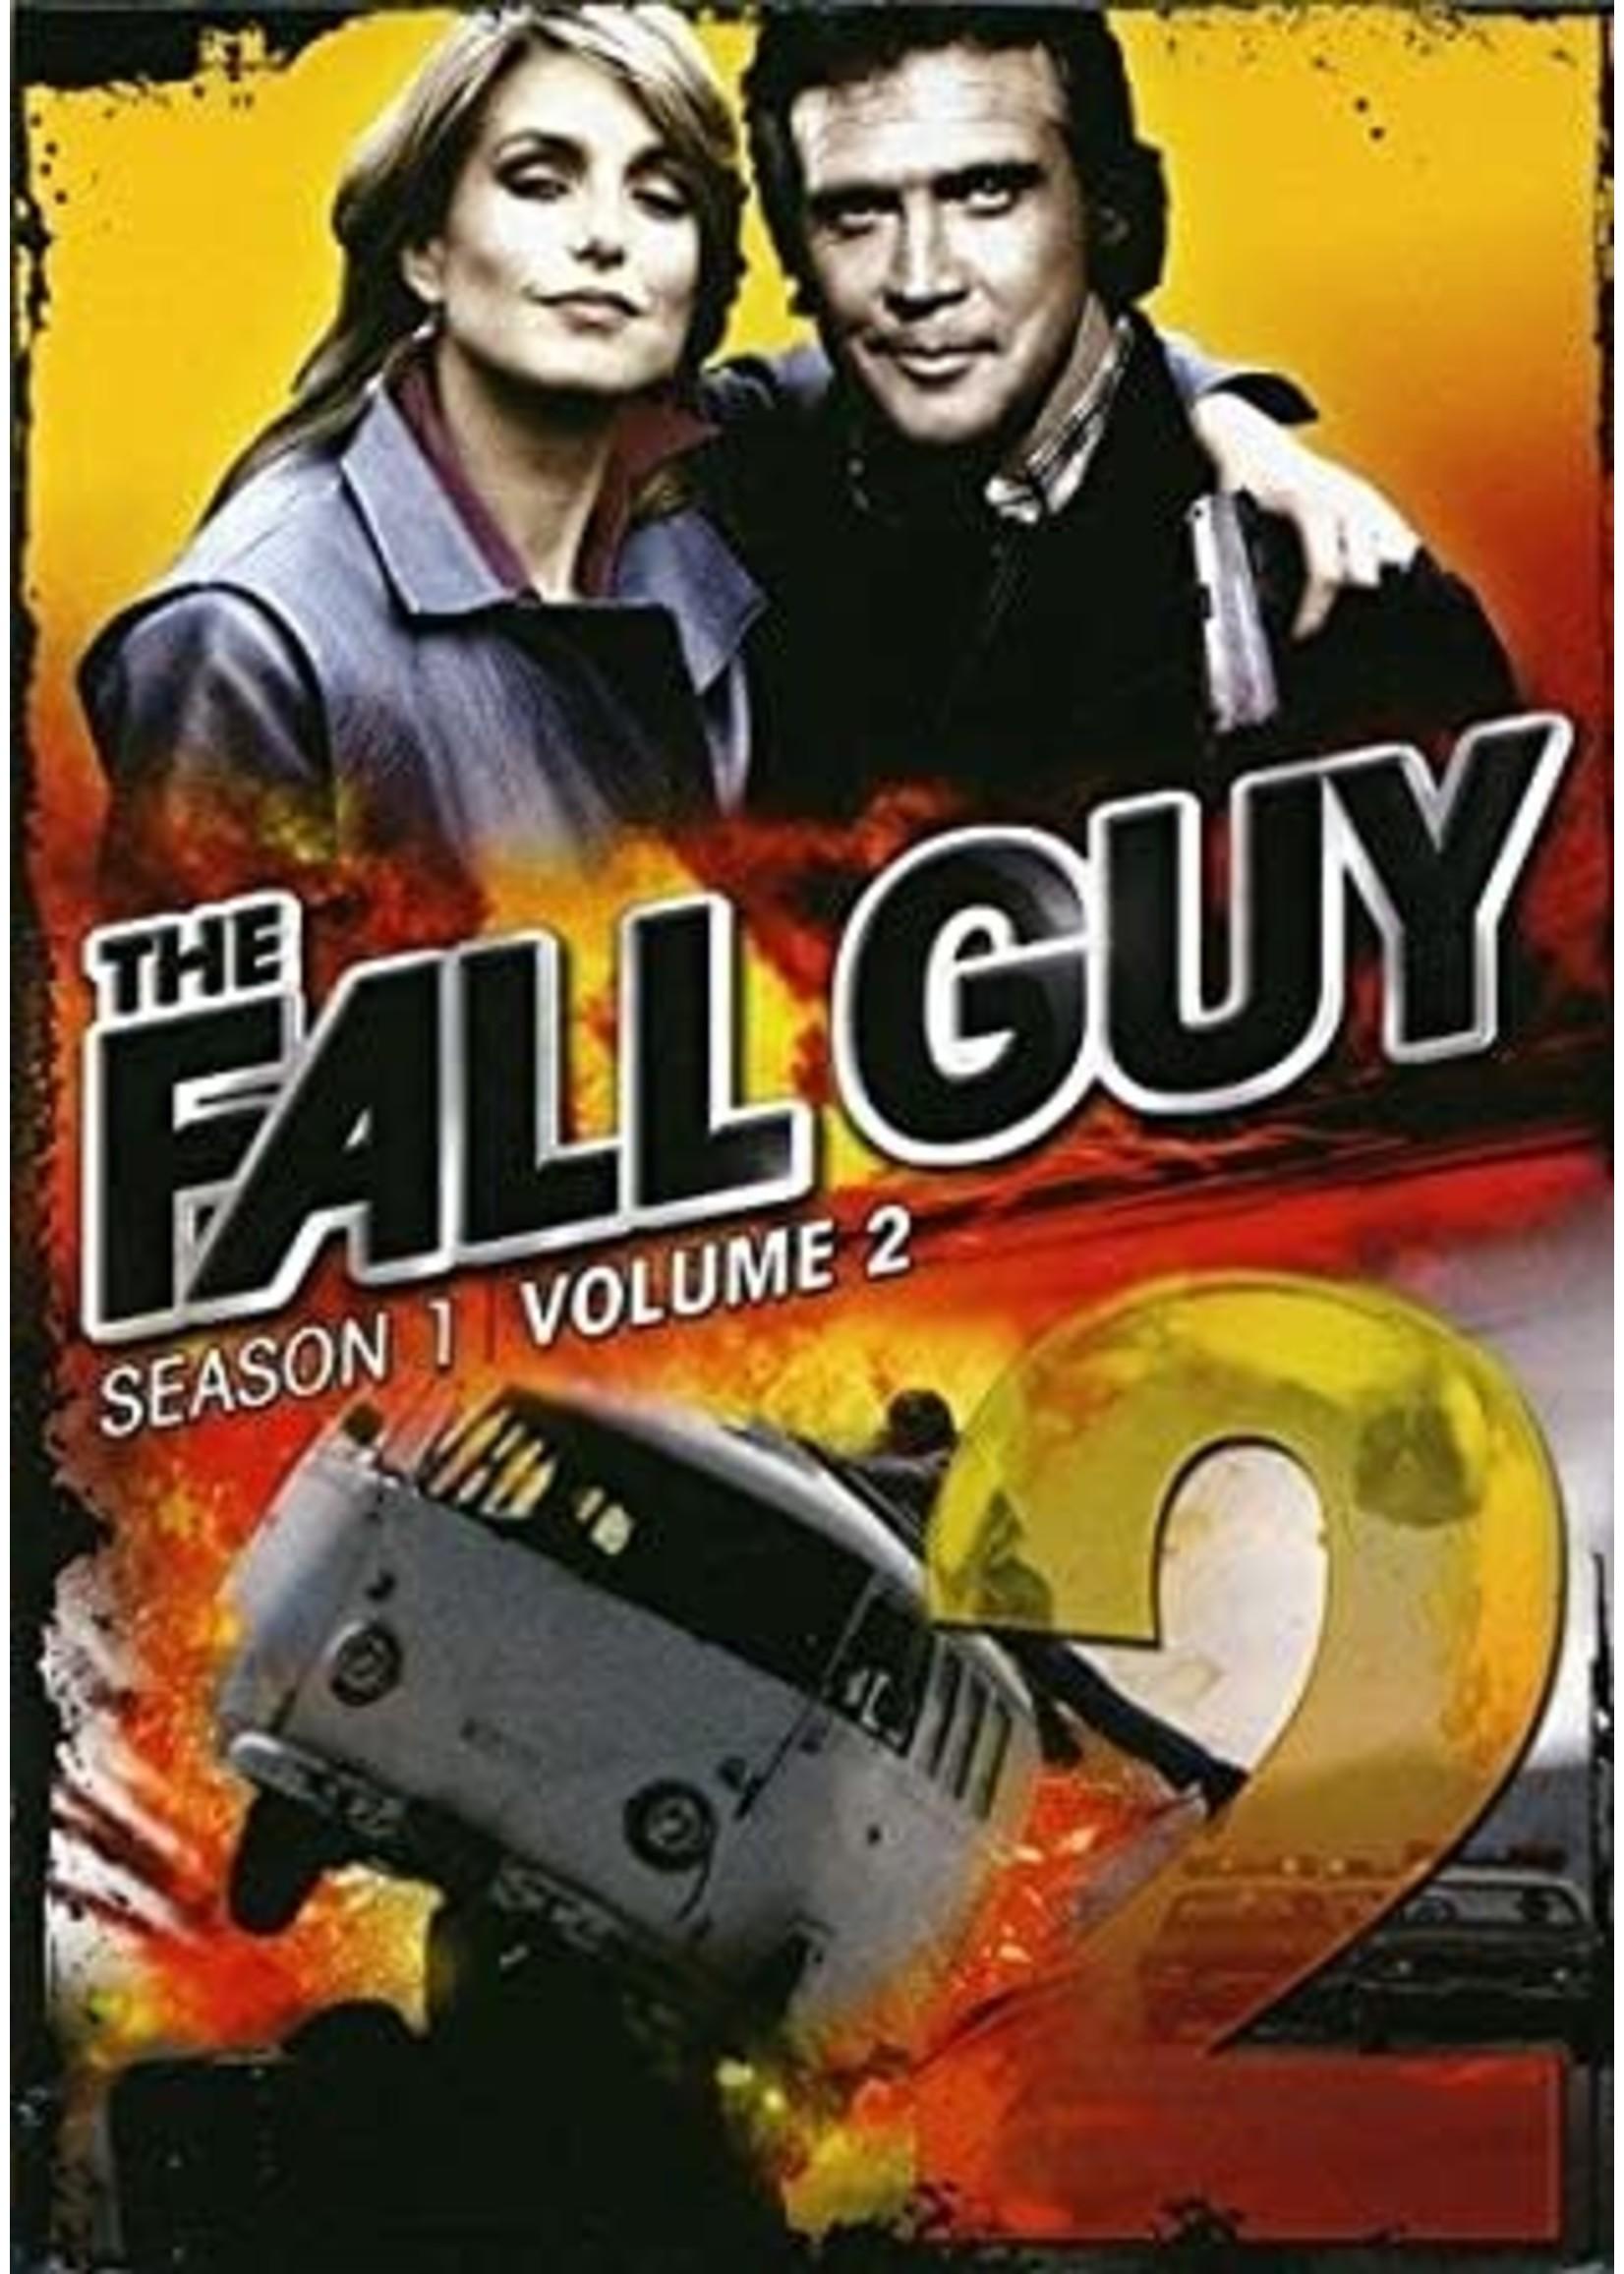 The Fall Guy: Season 1, Volume 2 DVD